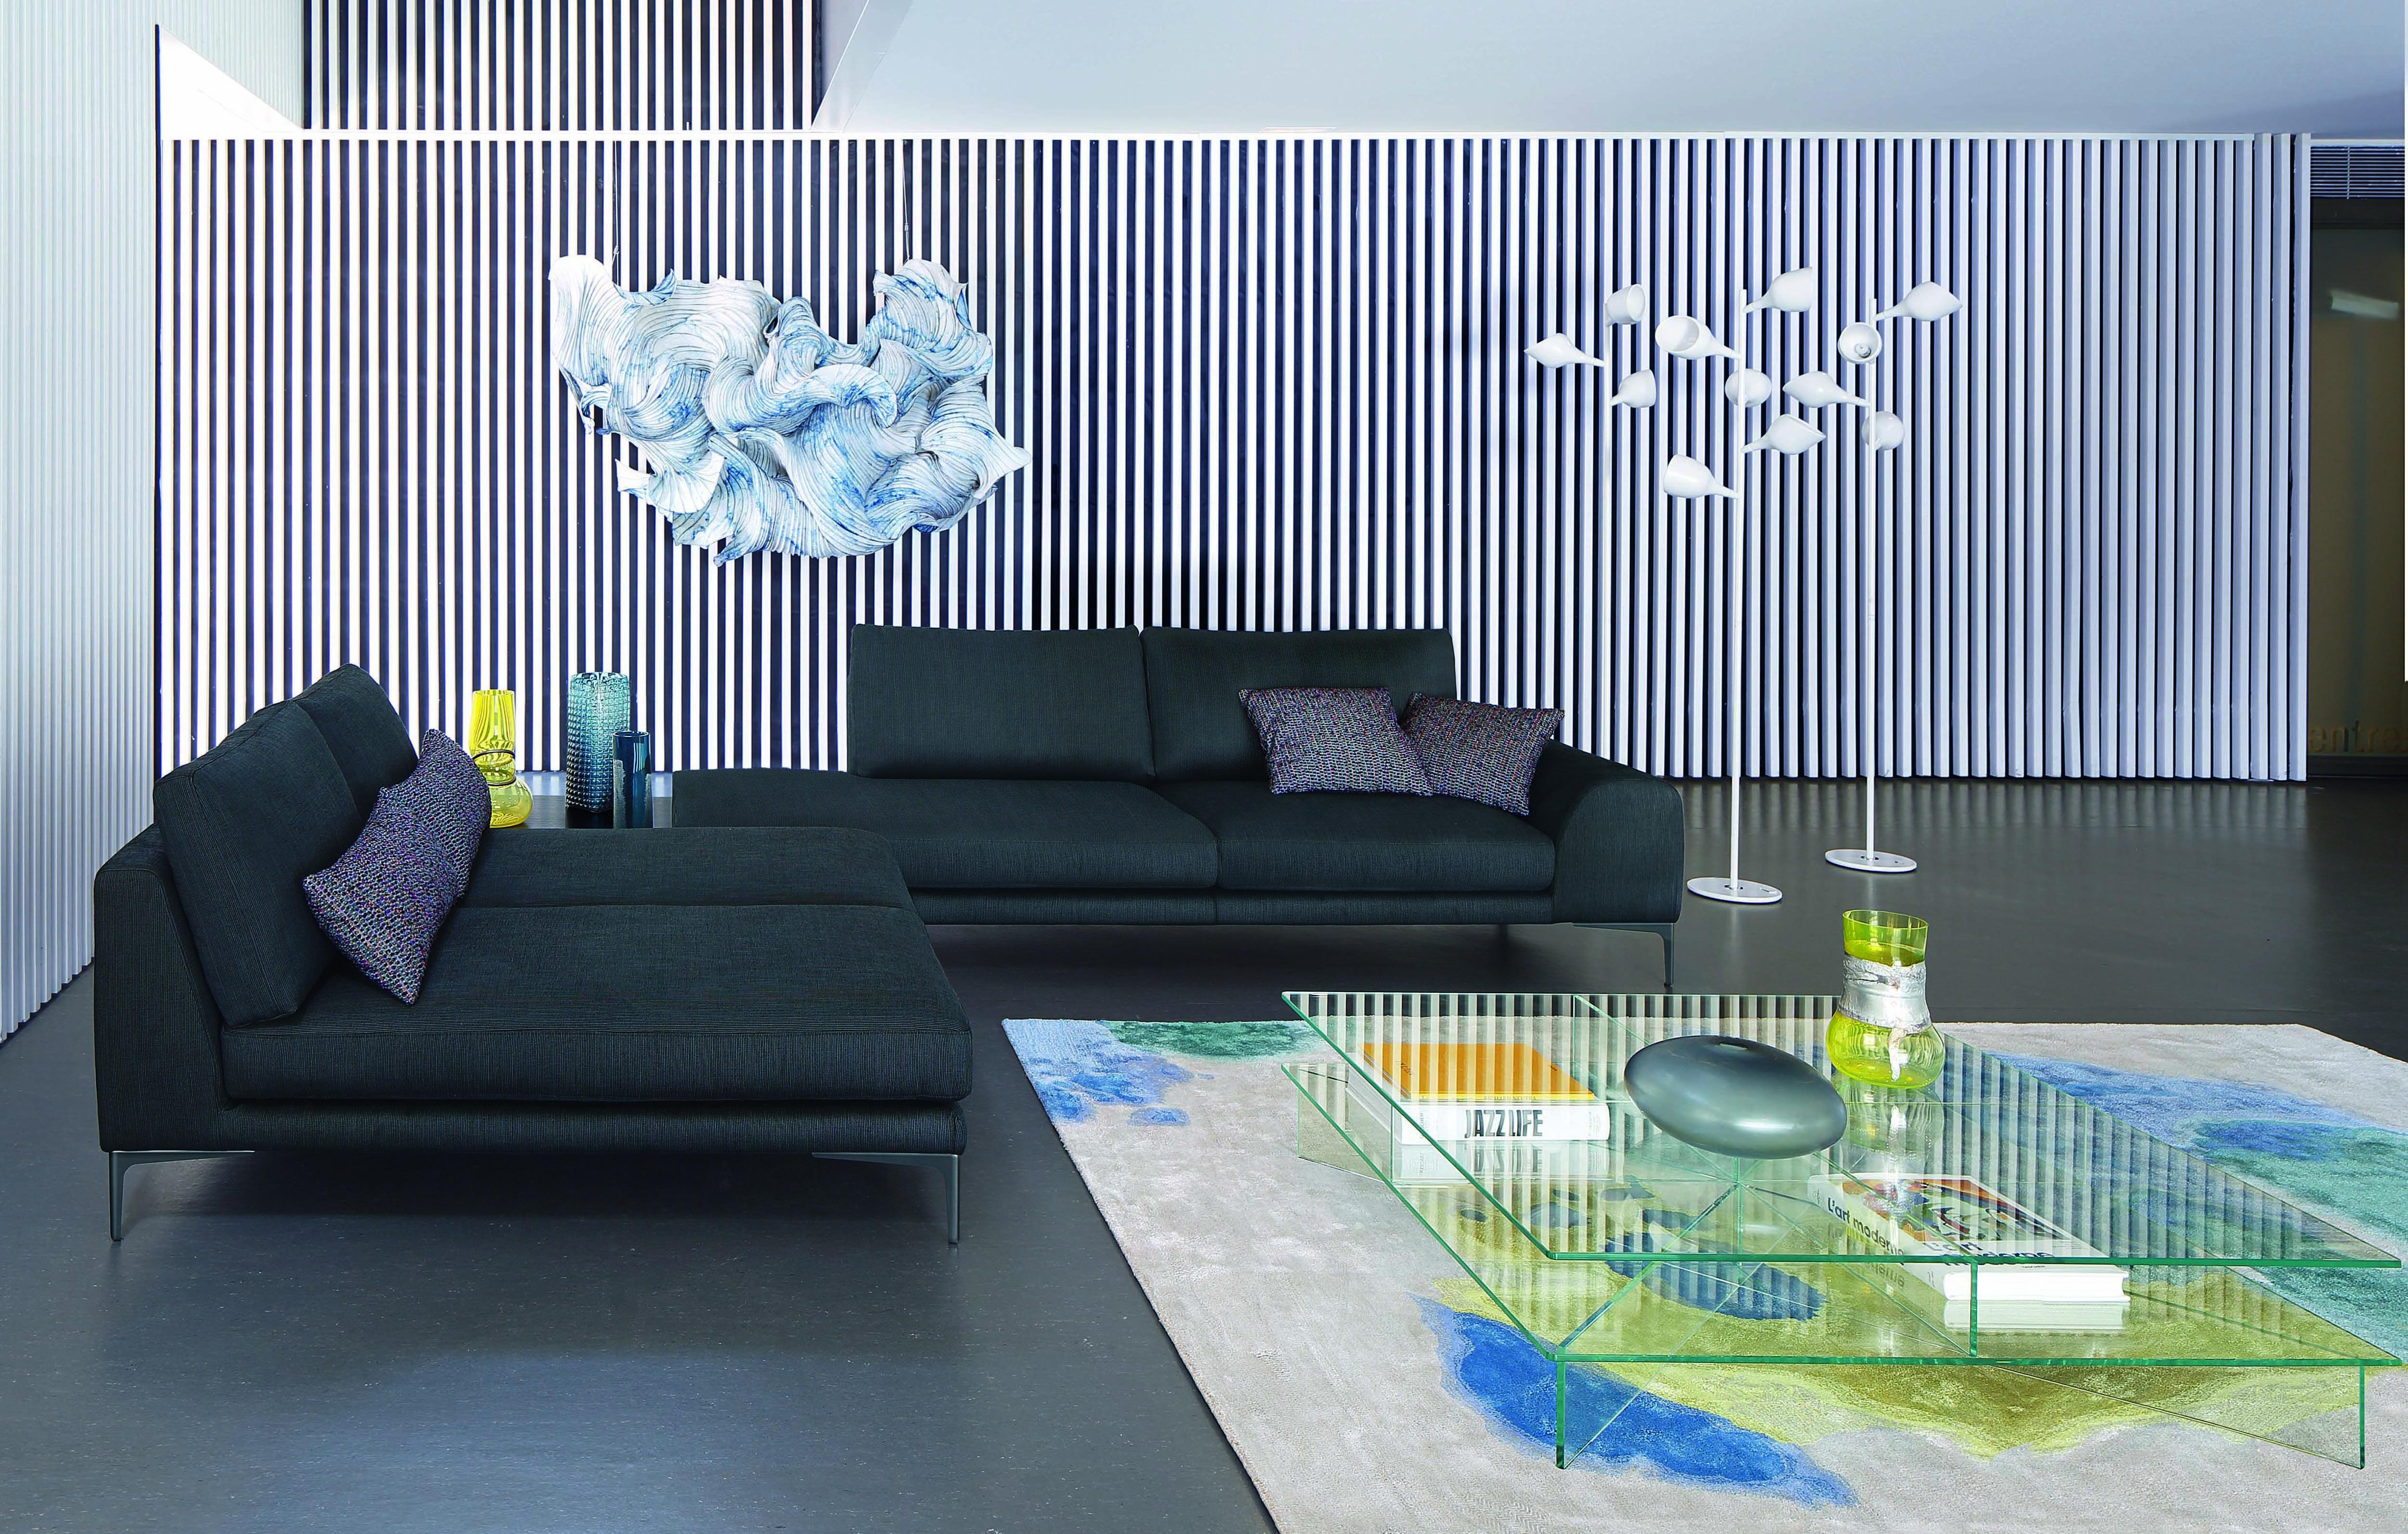 Roche Bobois EXCLAMATION modular sectional sofa Studio Roche